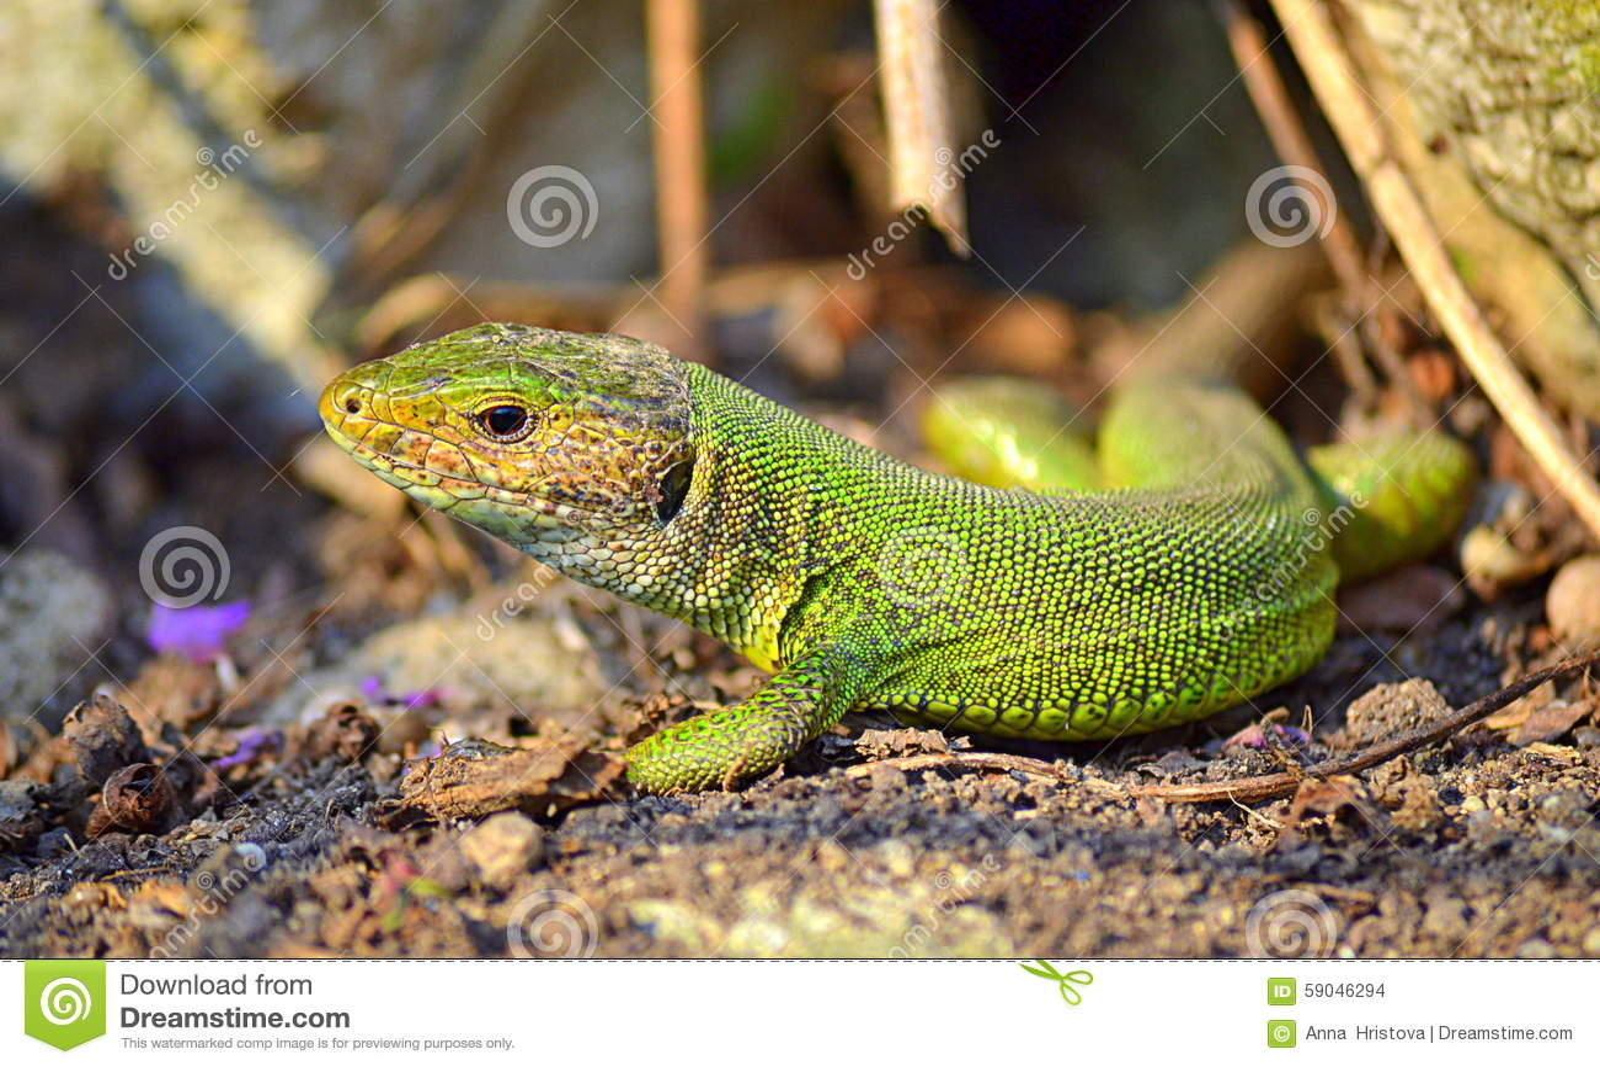 Green lizard in the sun